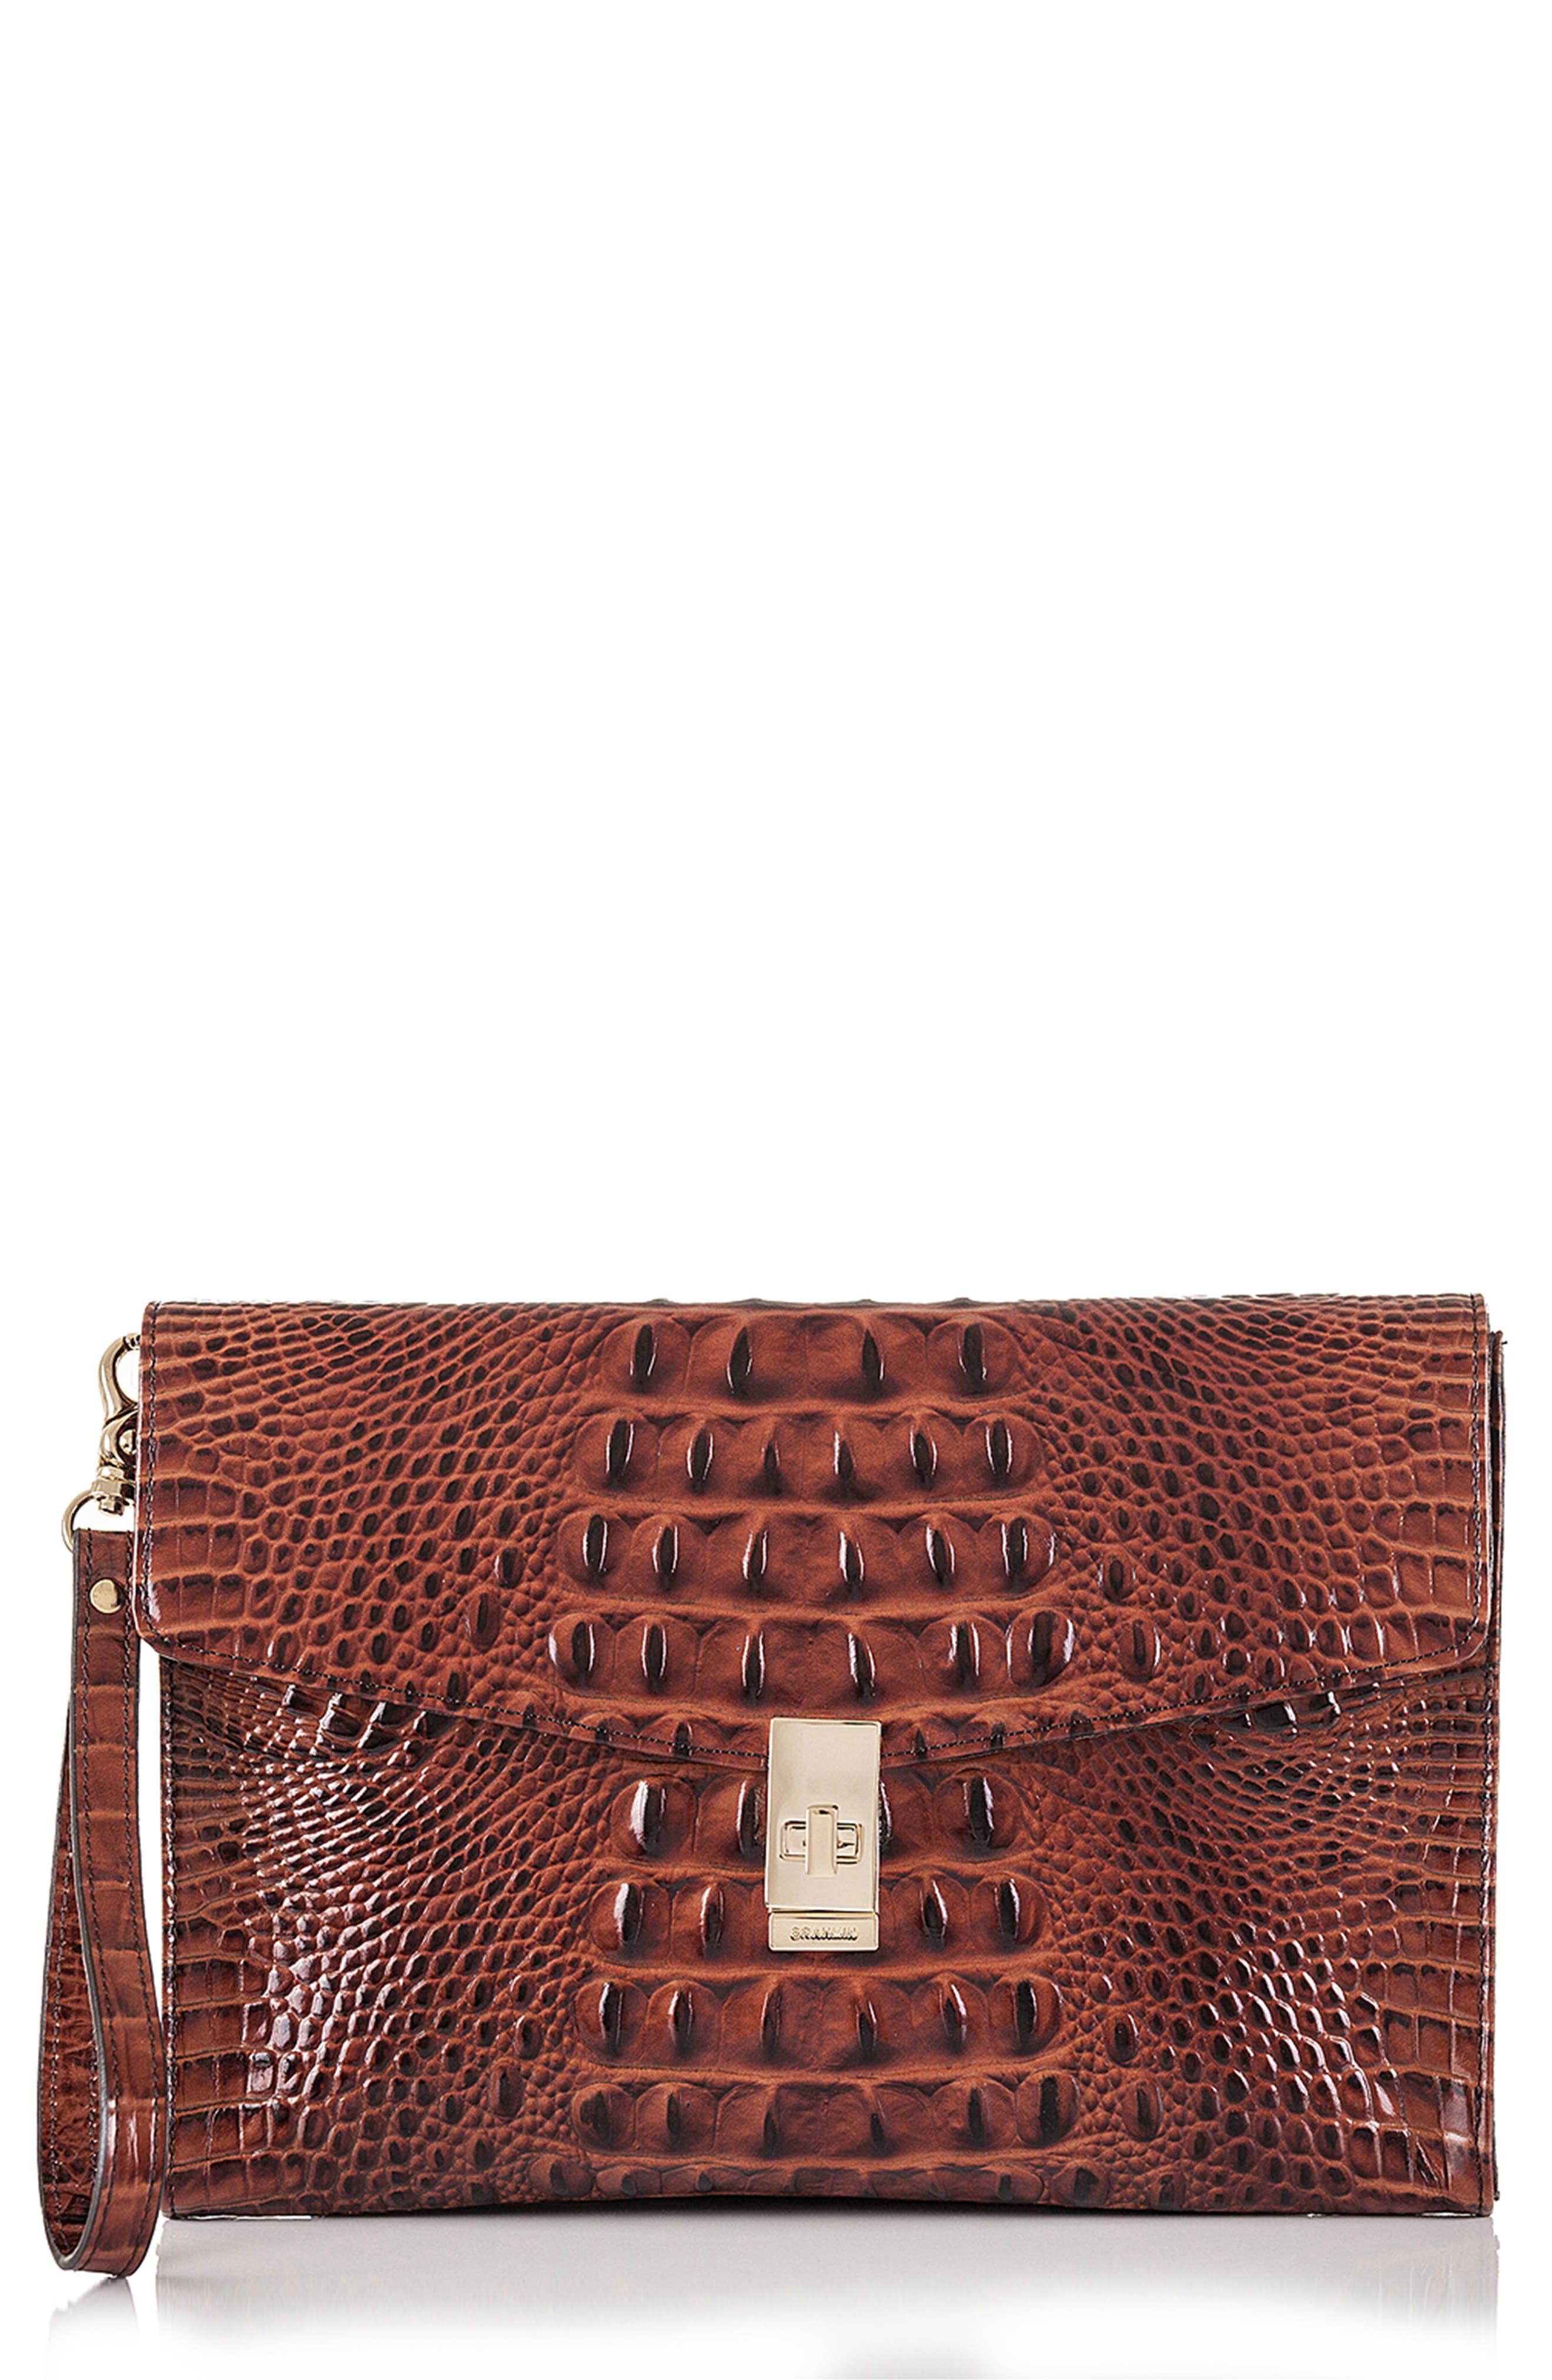 BRAHMIN Ruth Croc Embossed Leather Clutch, Main, color, PECAN MELBOURNE